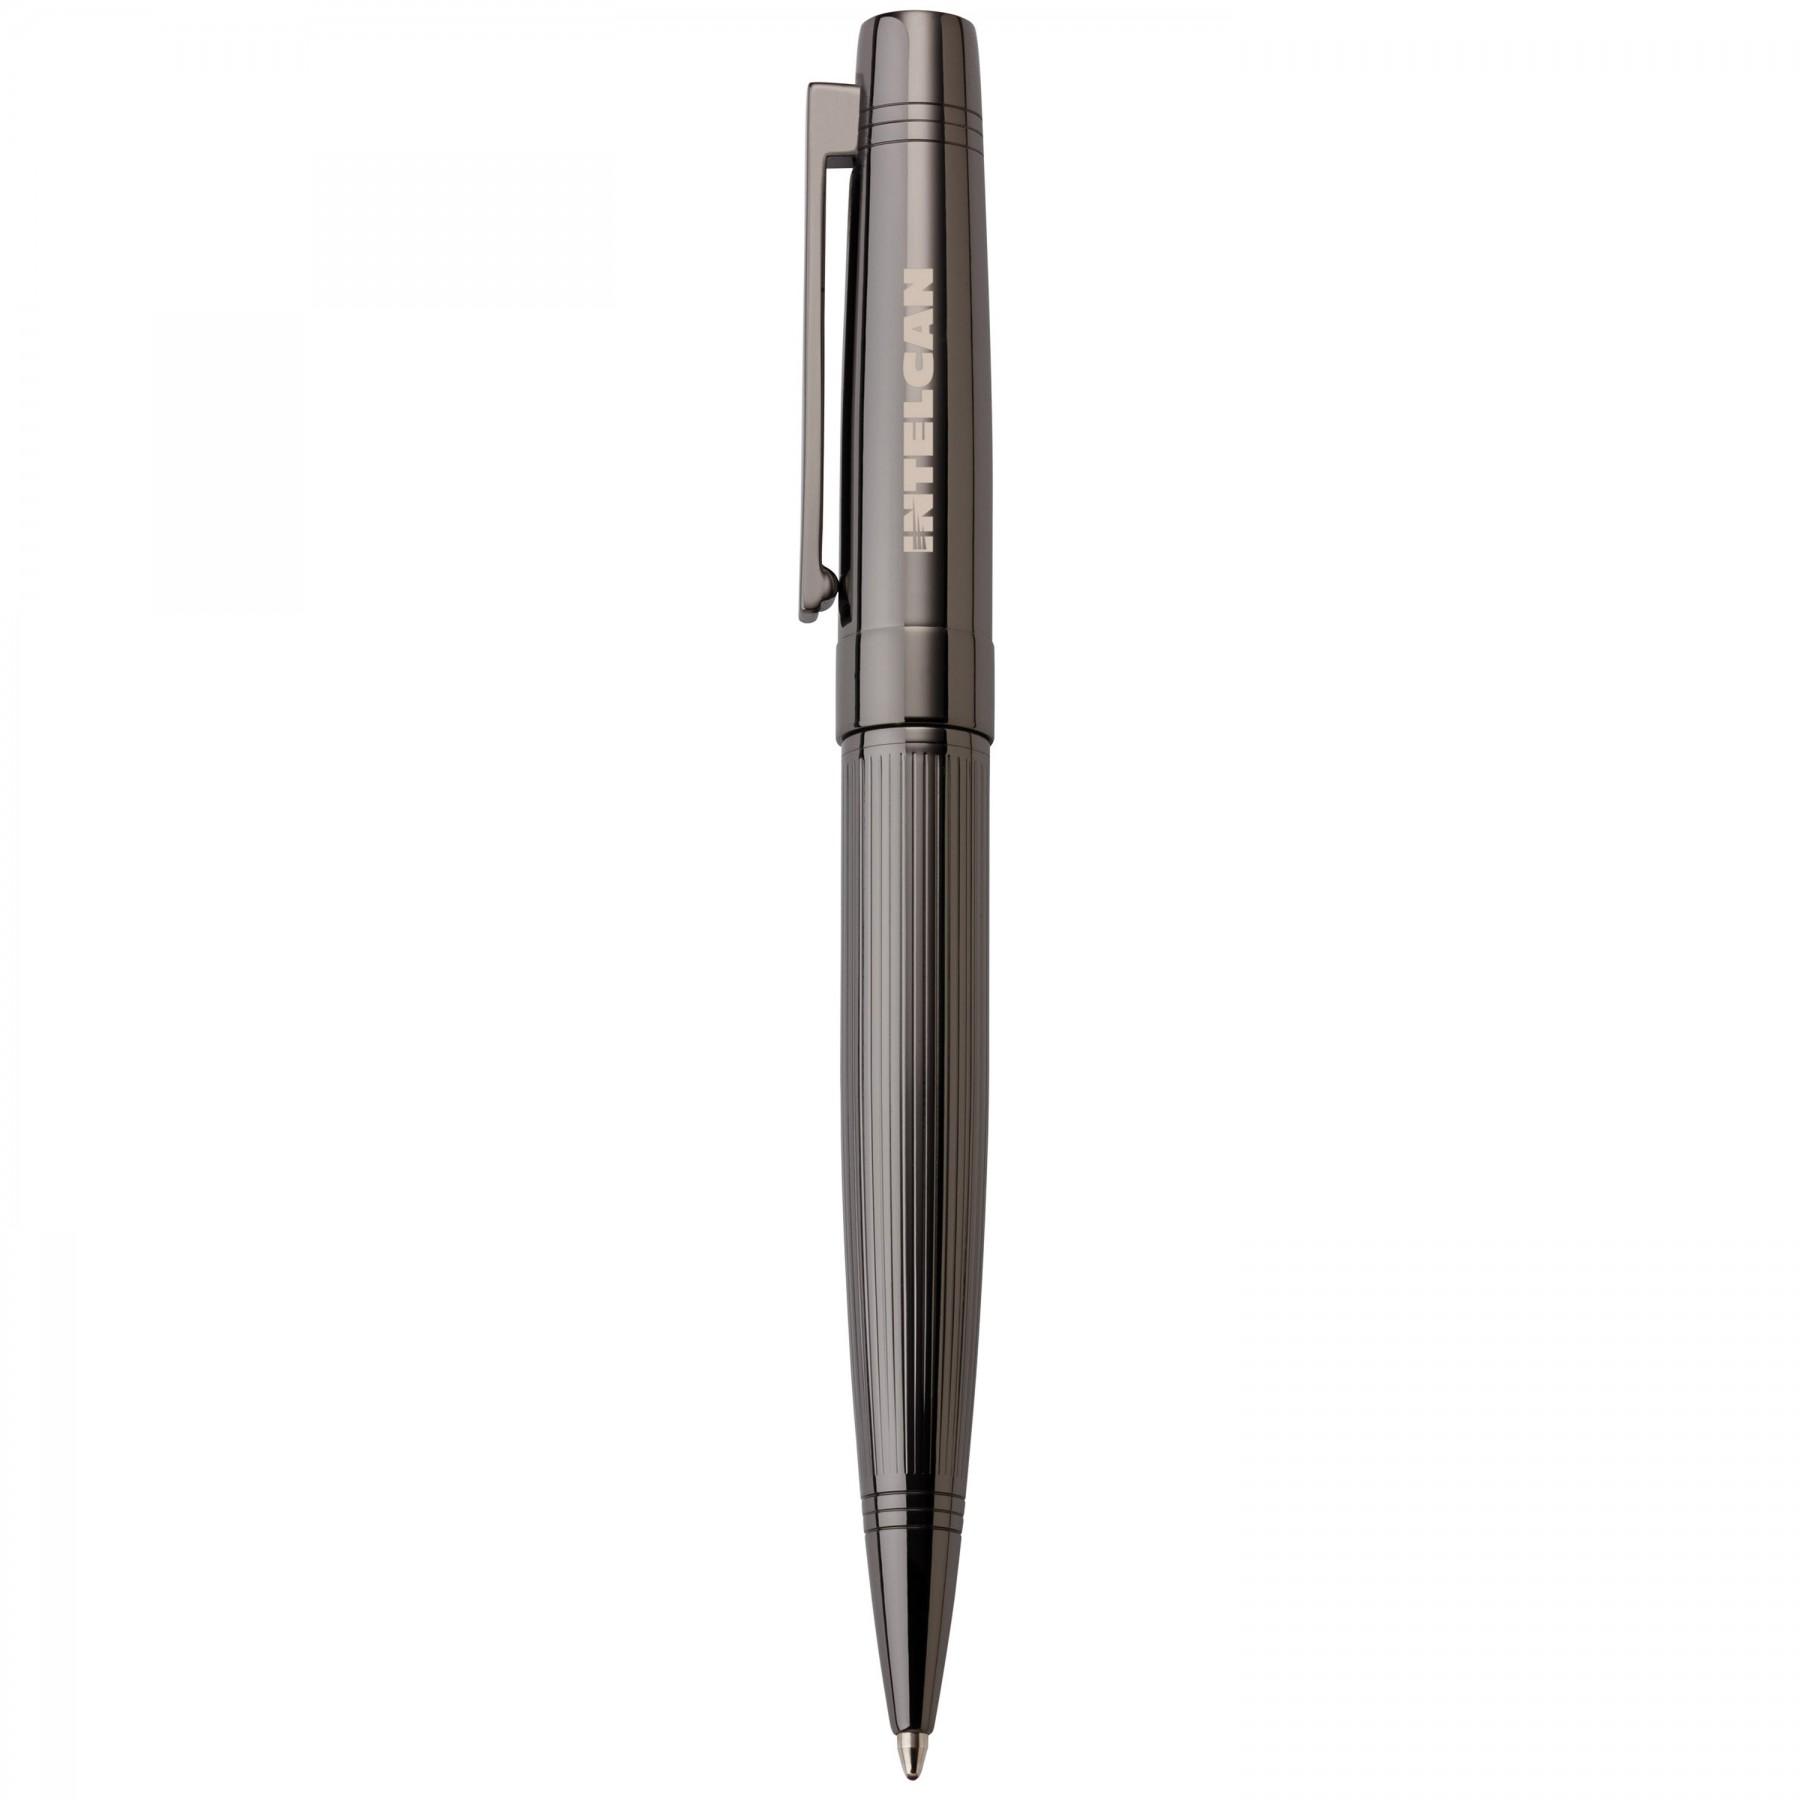 Spider Ballpoint Pen - Laser Engraved (G3142P)